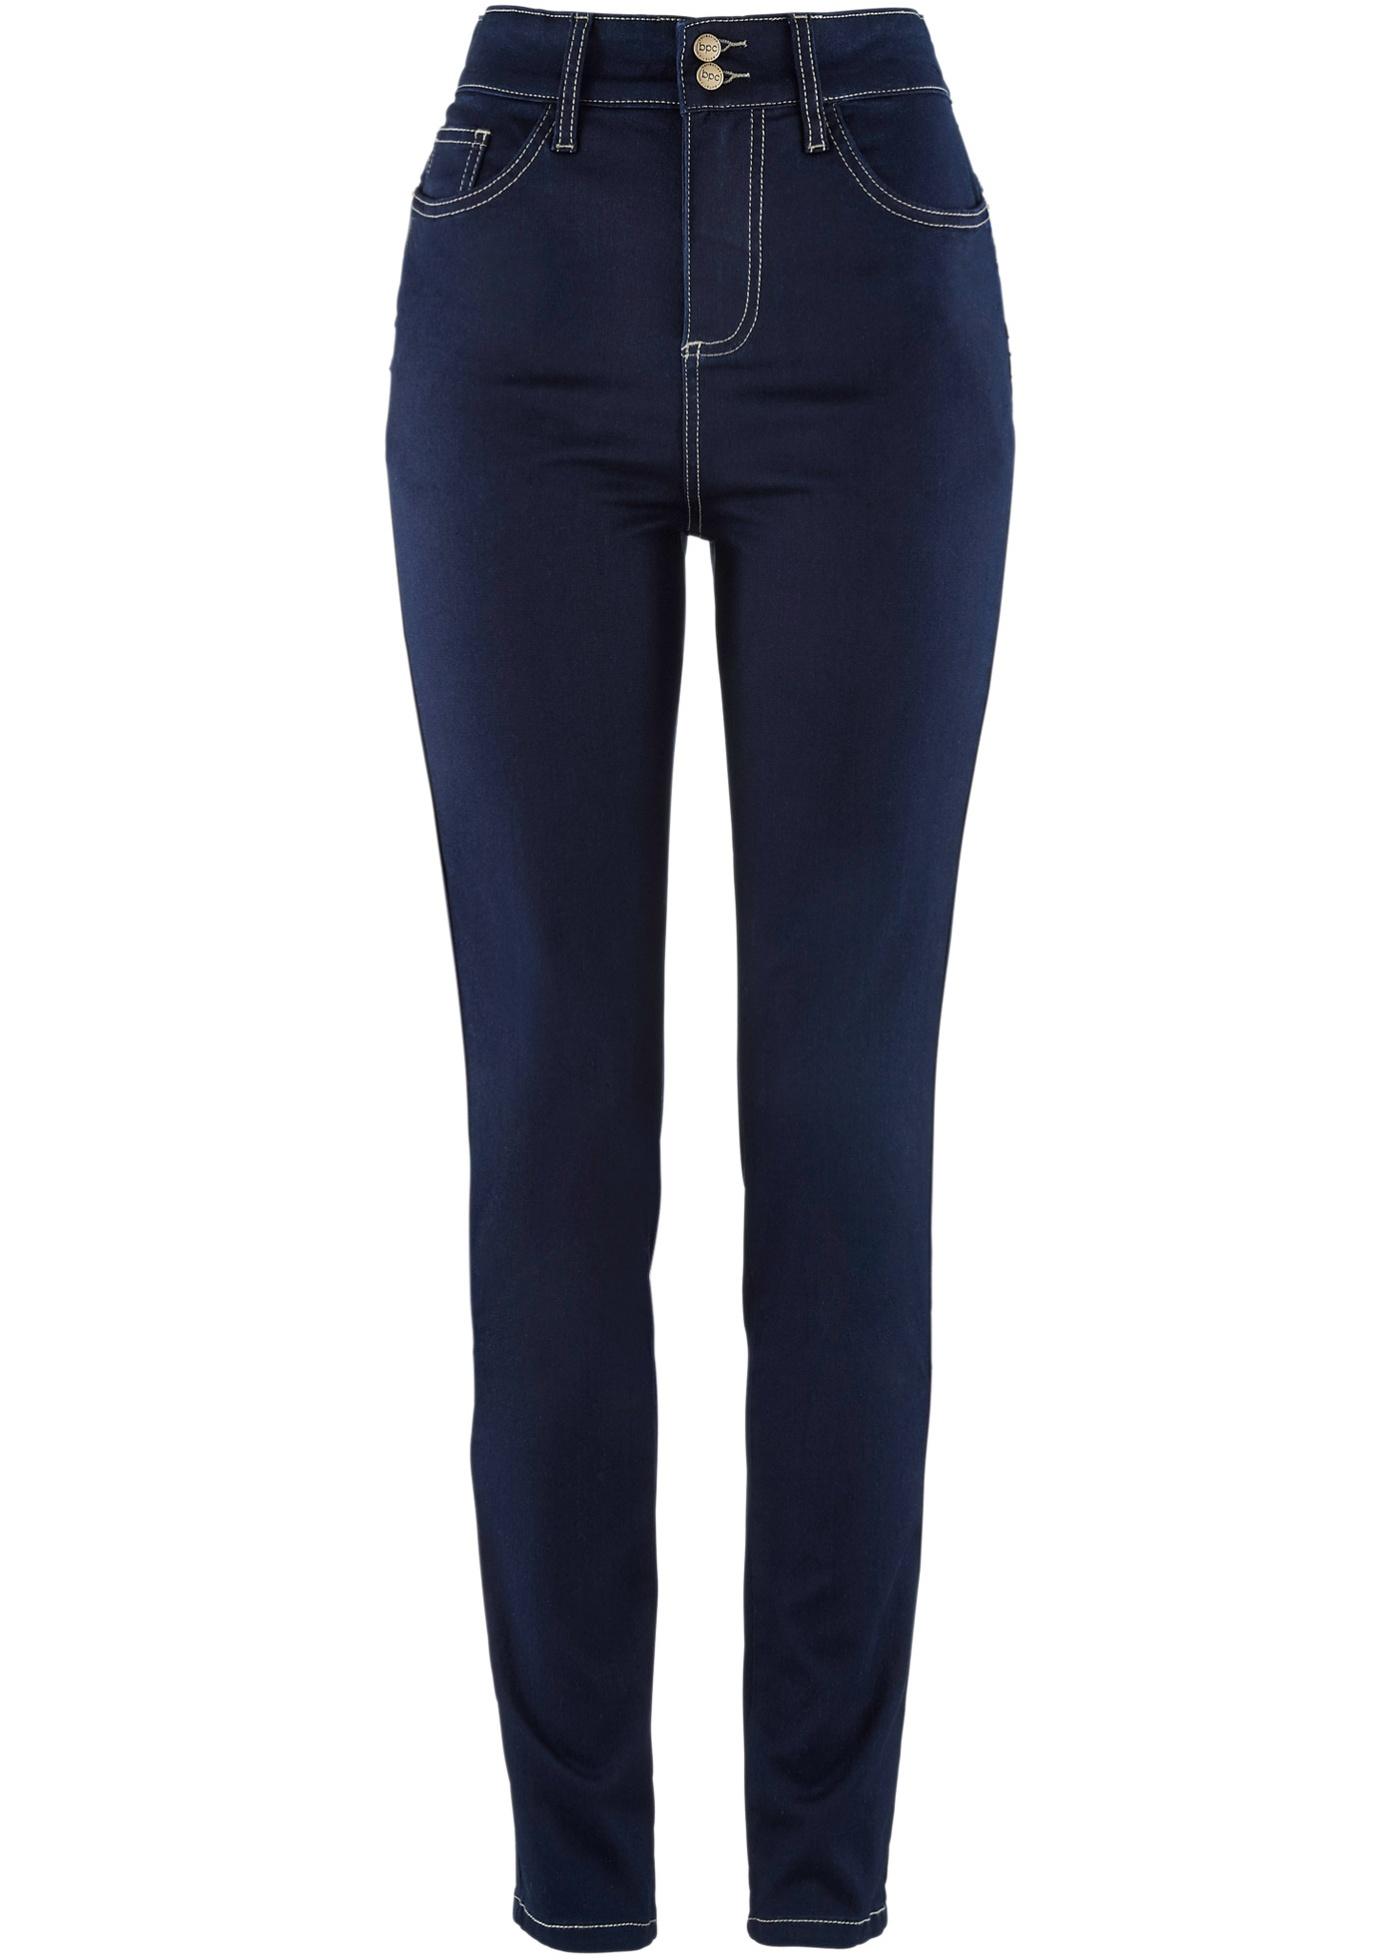 Bpc Power Pour Bonprix Femme CollectionJean up Push Noir StretchHighwaist uTlKc5F13J